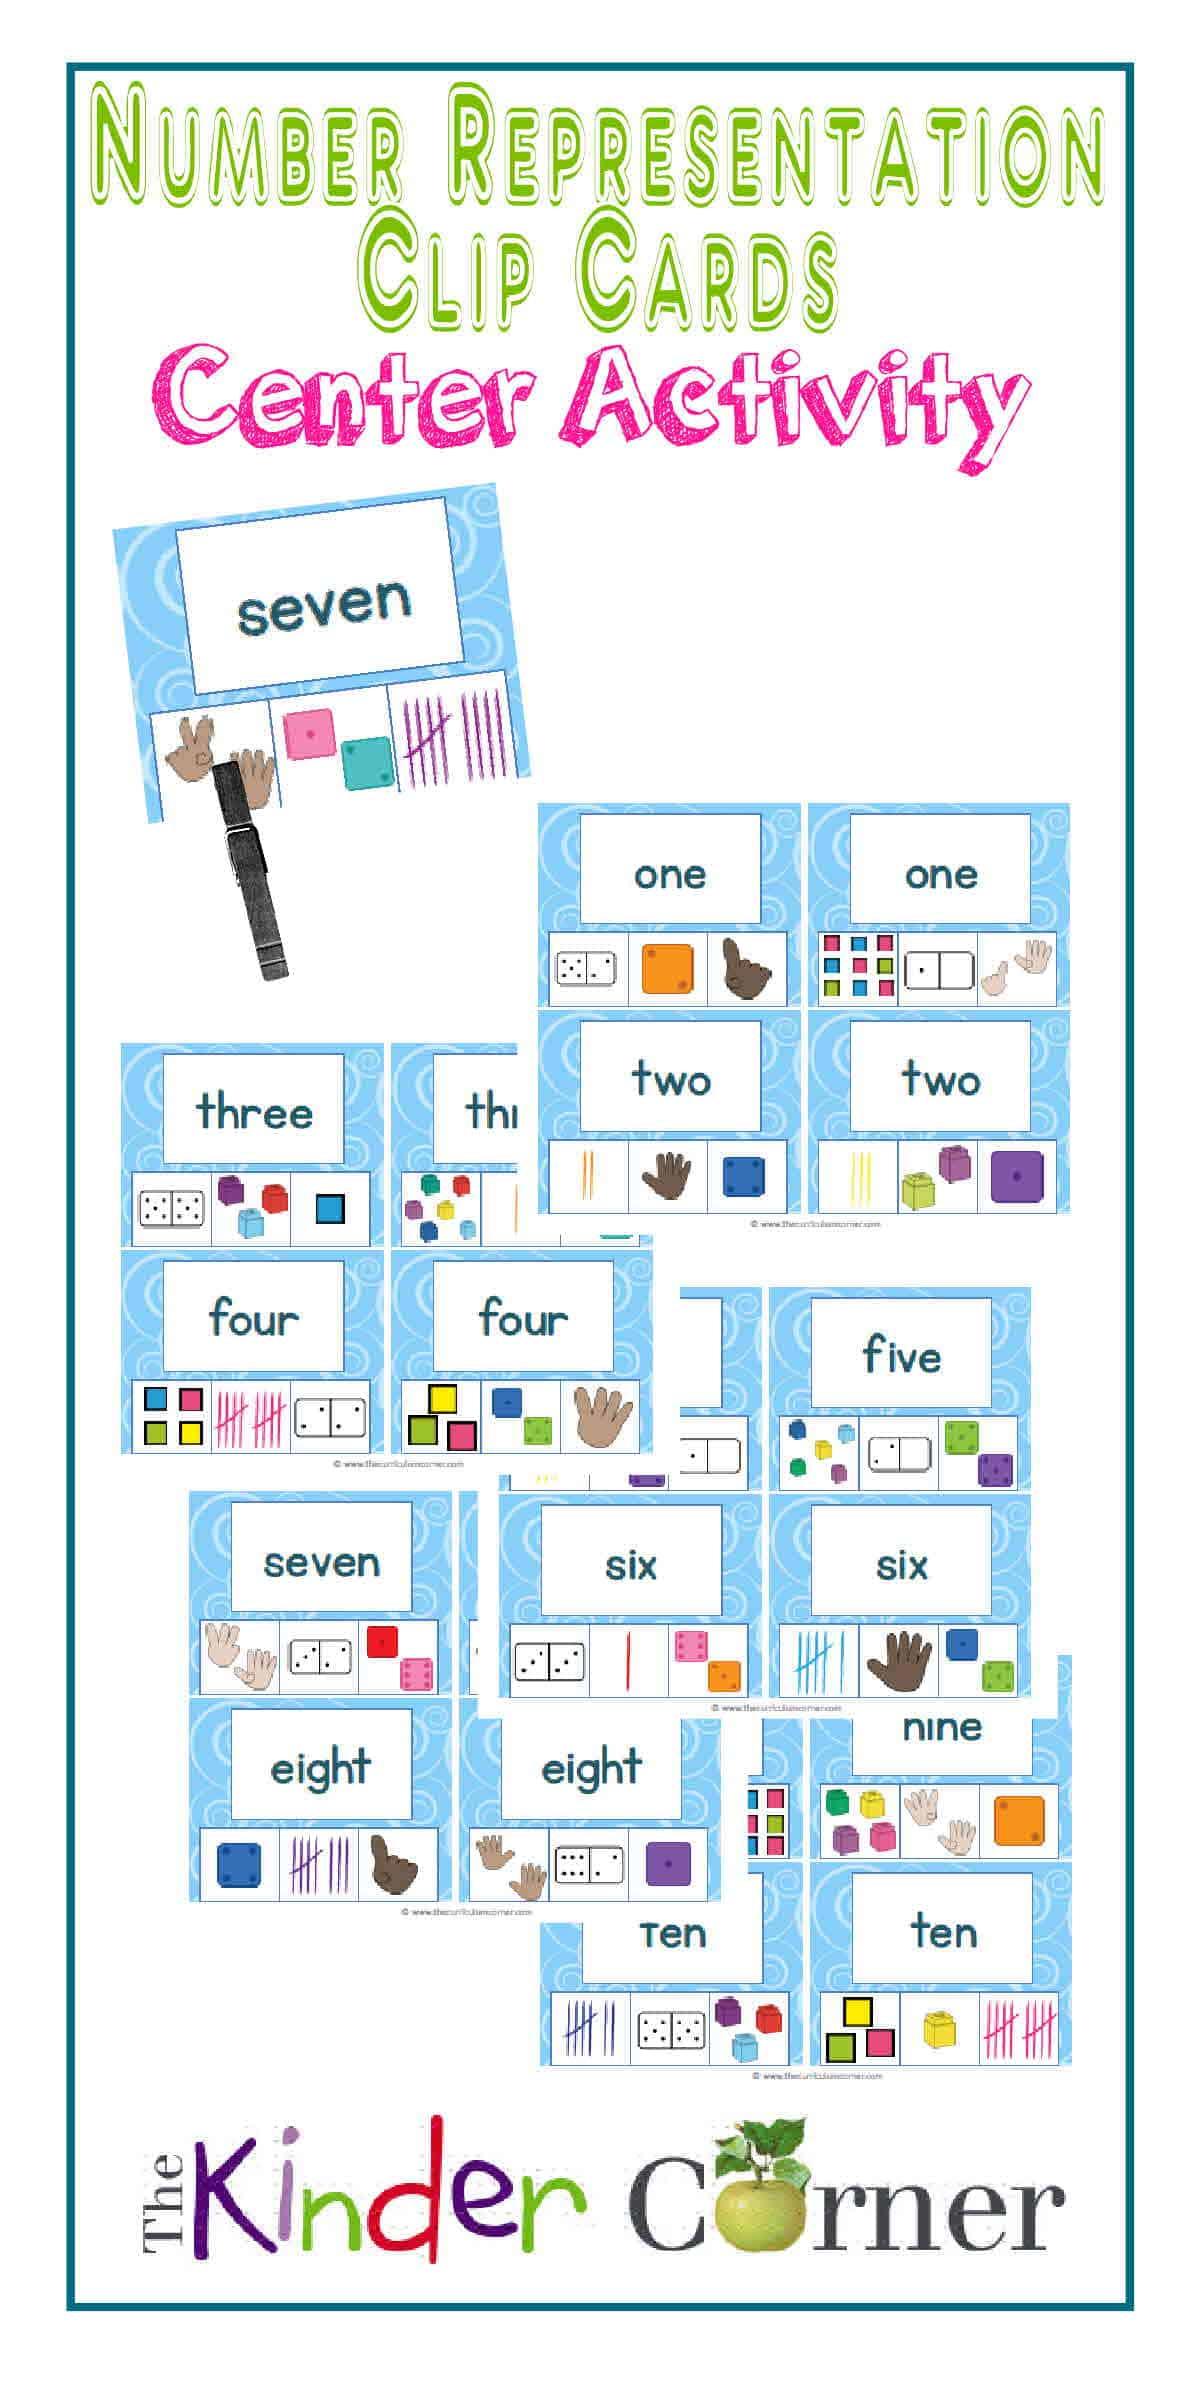 Number Representation Clip Cards